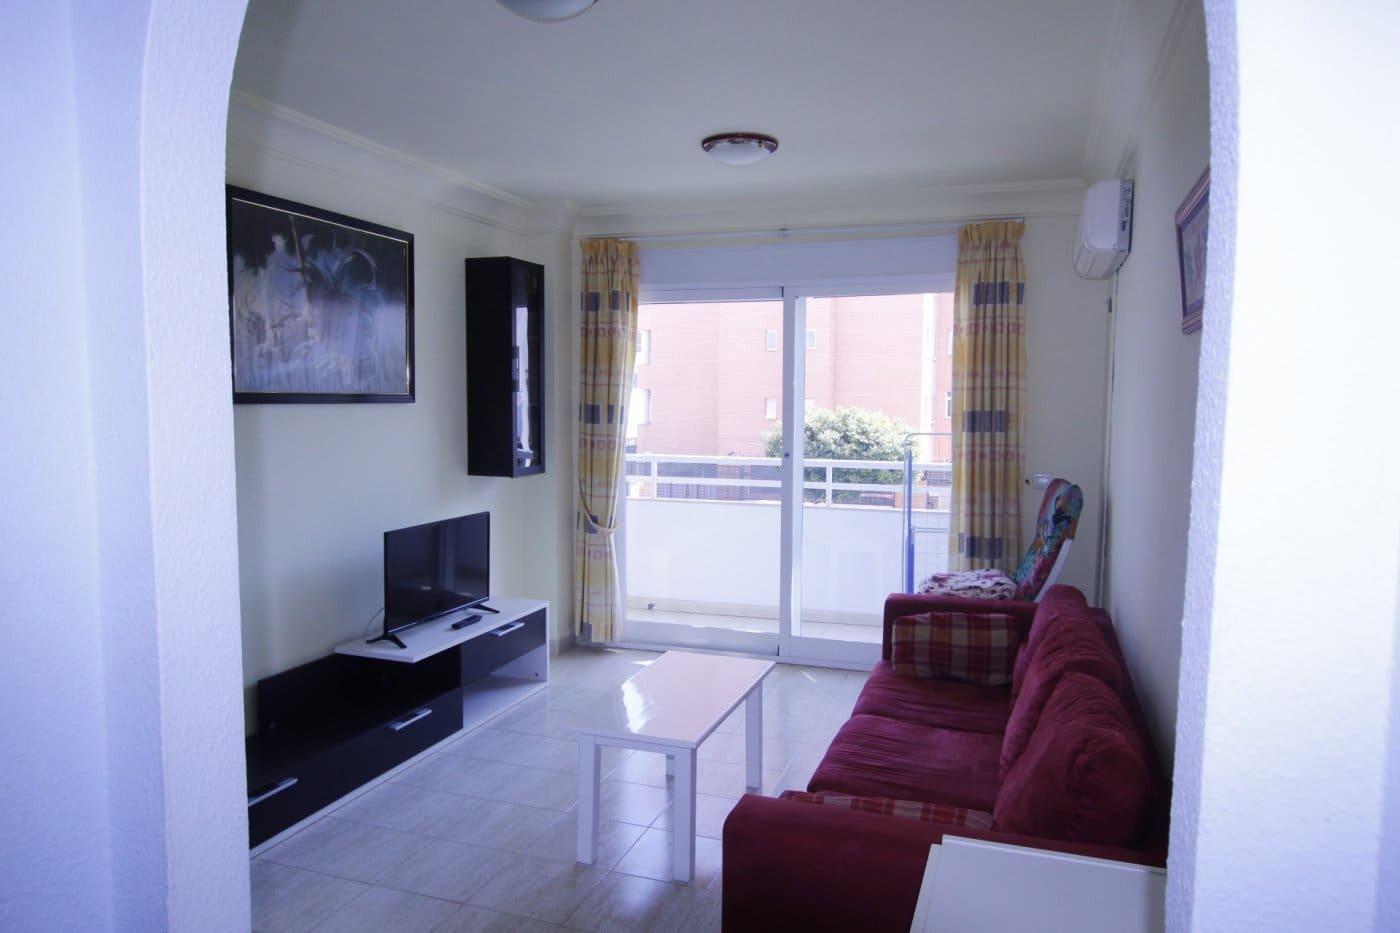 2 slaapkamer Appartement te huur in La Villajoyosa / Vila Joiosa - € 500 (Ref: 5319824)